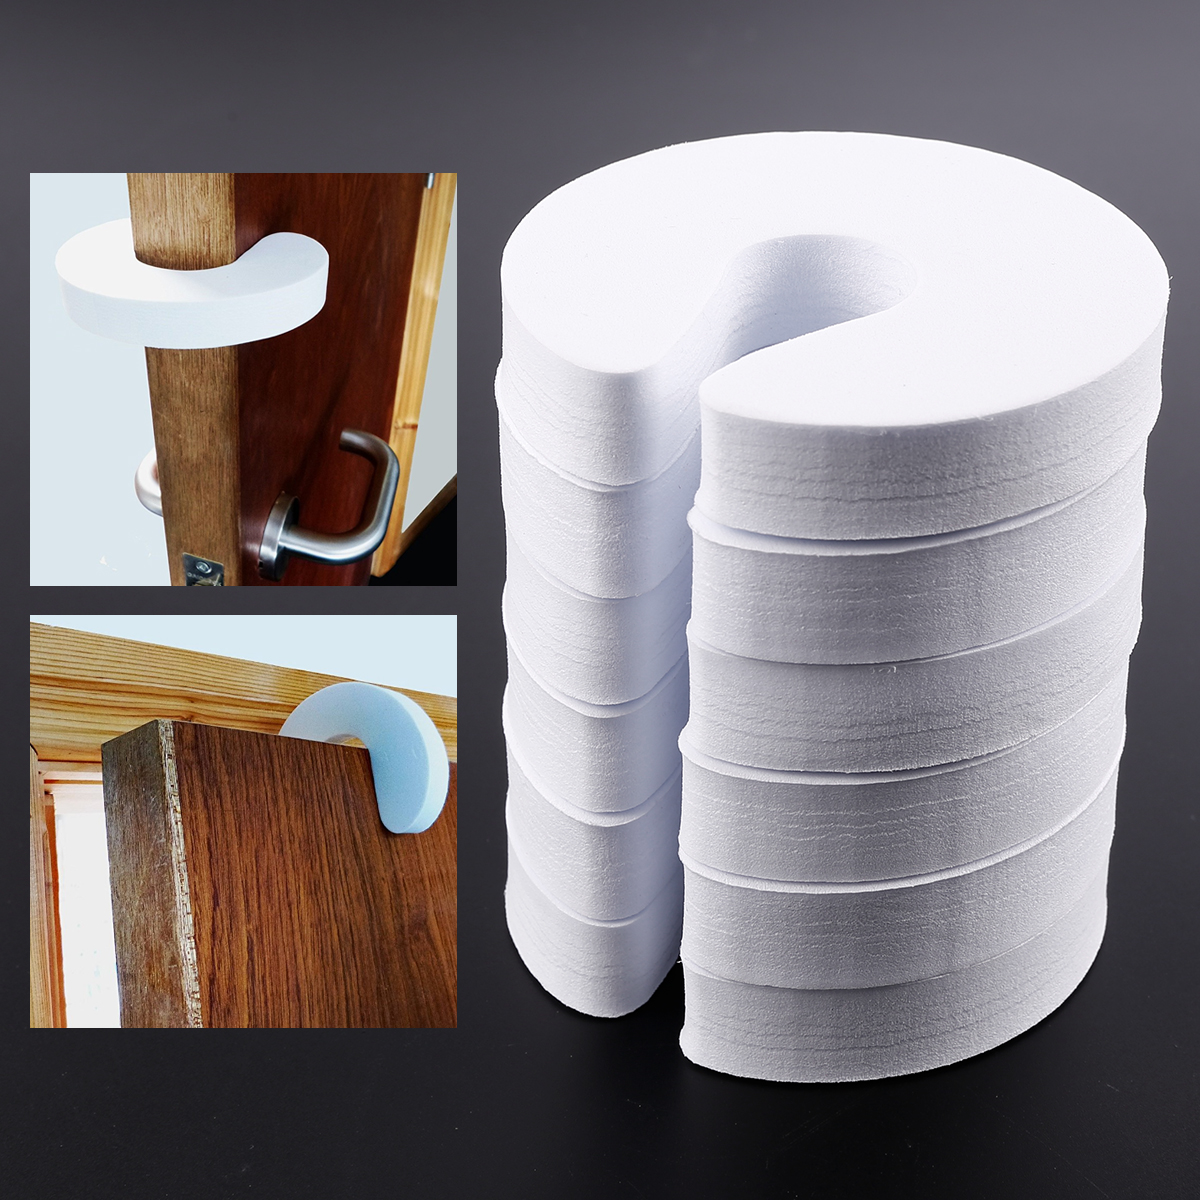 6er wei schaumstoff t rstopper doorstop finger klemmschutz kindersicherung 37 ebay. Black Bedroom Furniture Sets. Home Design Ideas